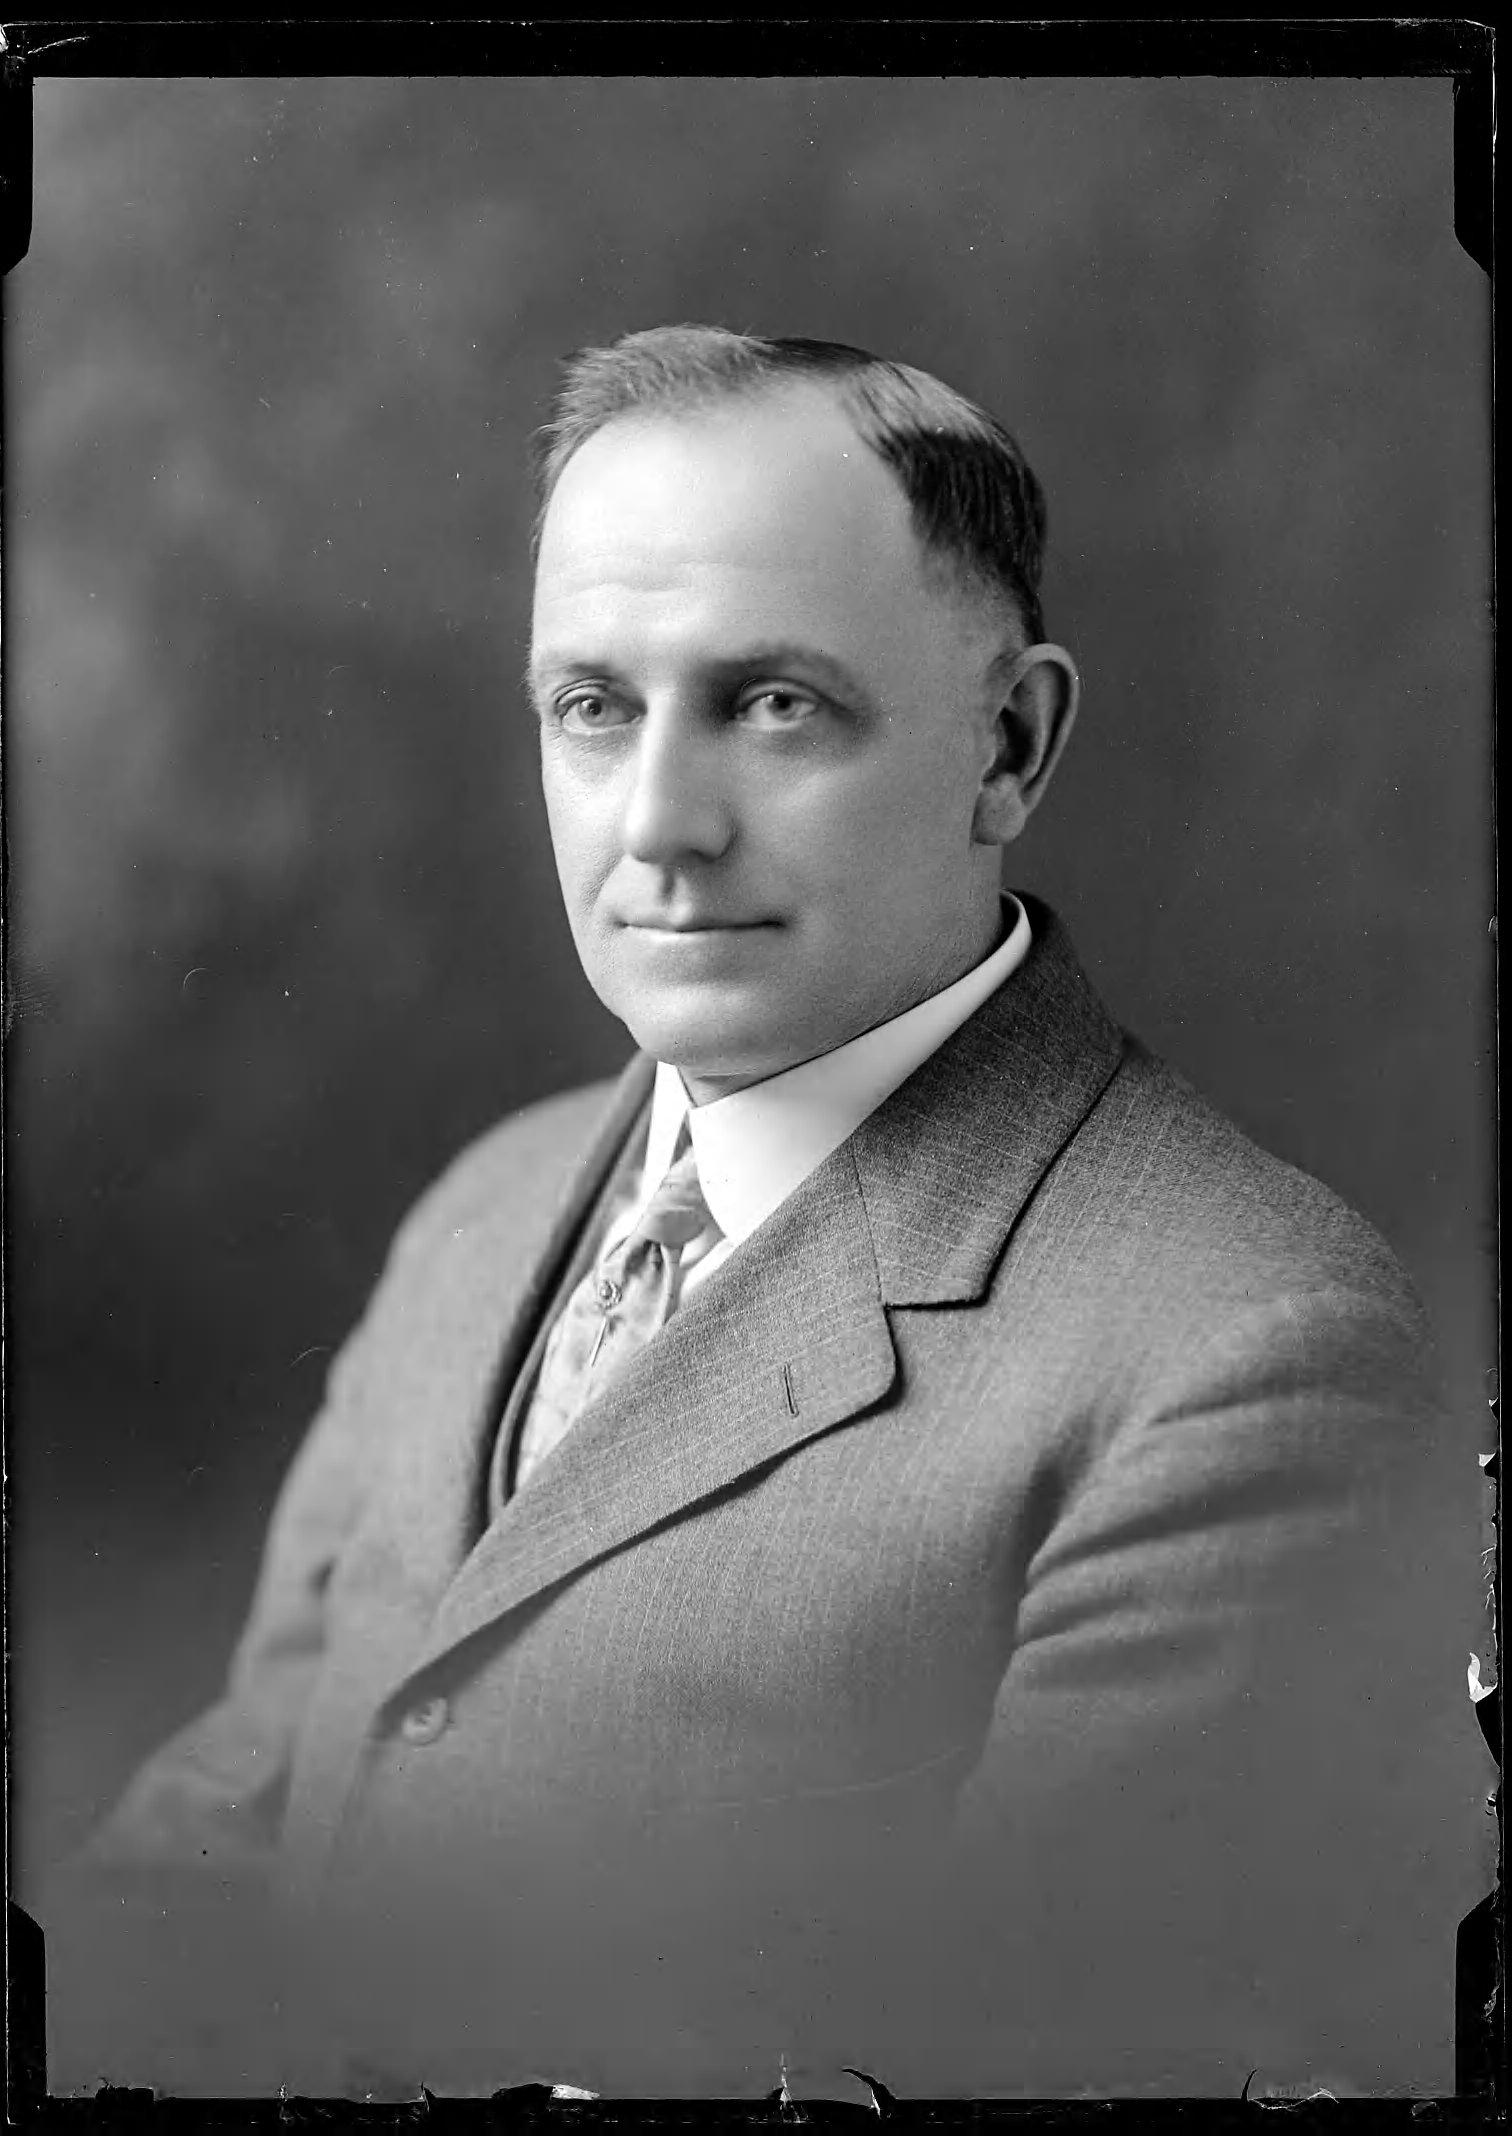 John N. Fitts